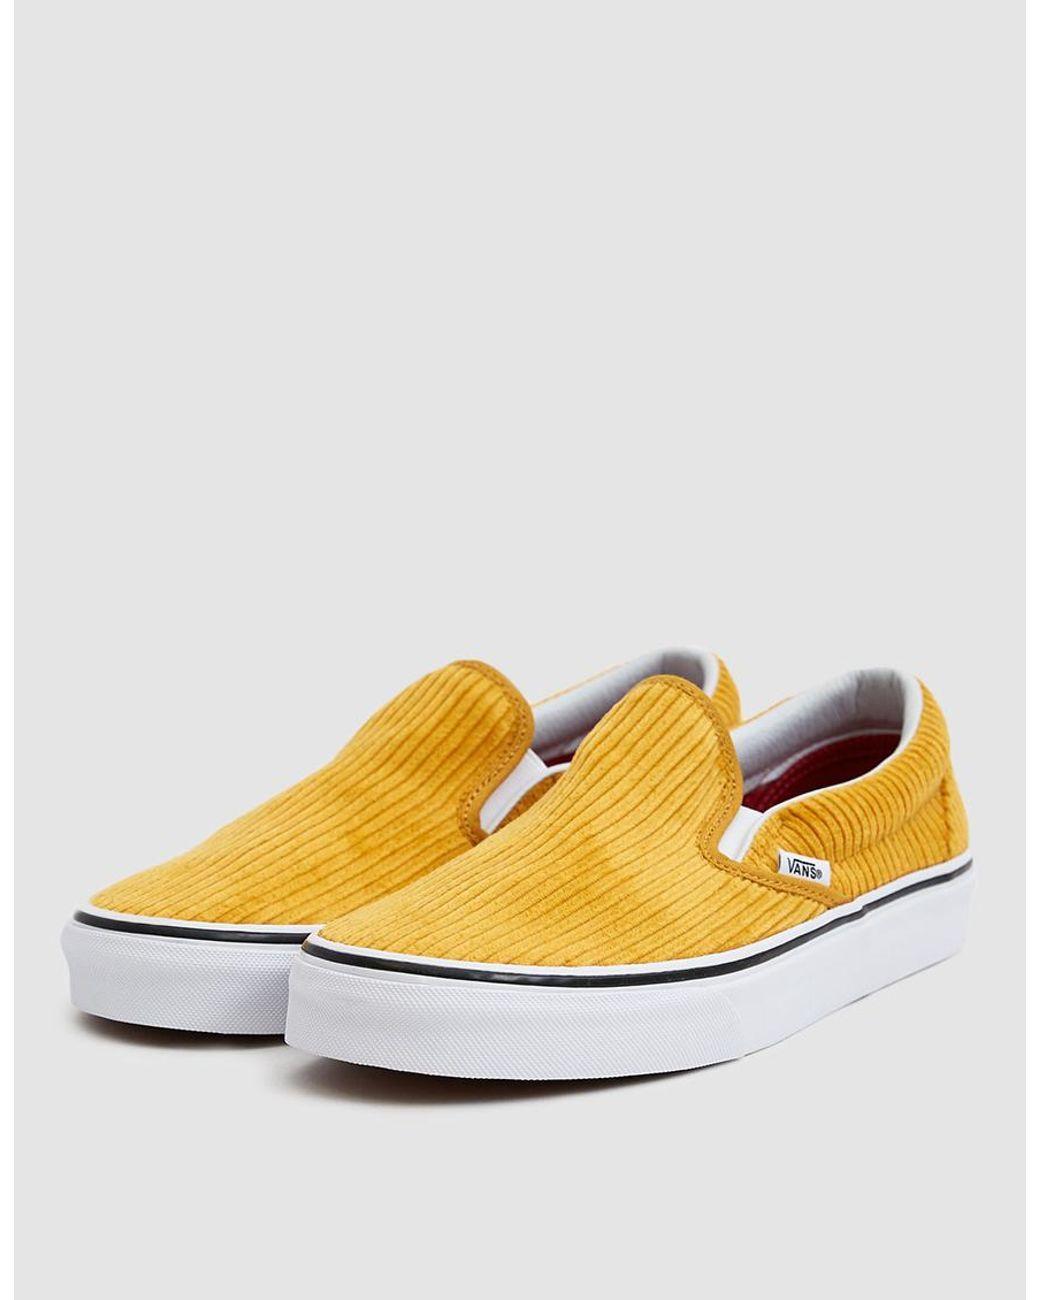 Vans Yellow Corduroy Classic Slip-on